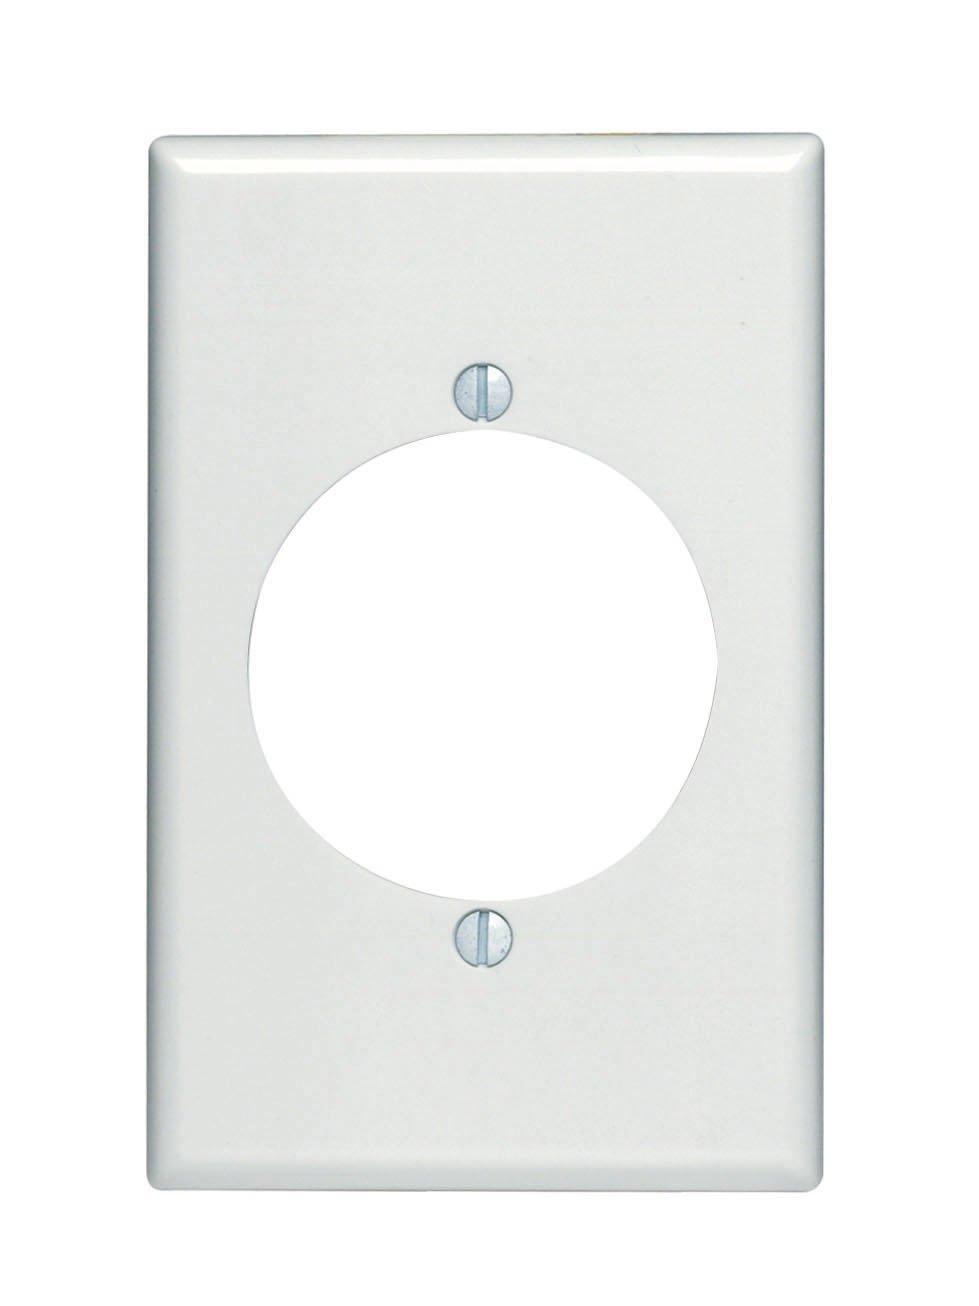 Leviton 80528-W 1-Gang Flush Mount 2.15-Inch Diameter, Device Receptacle Wallplate, Midway Size, White